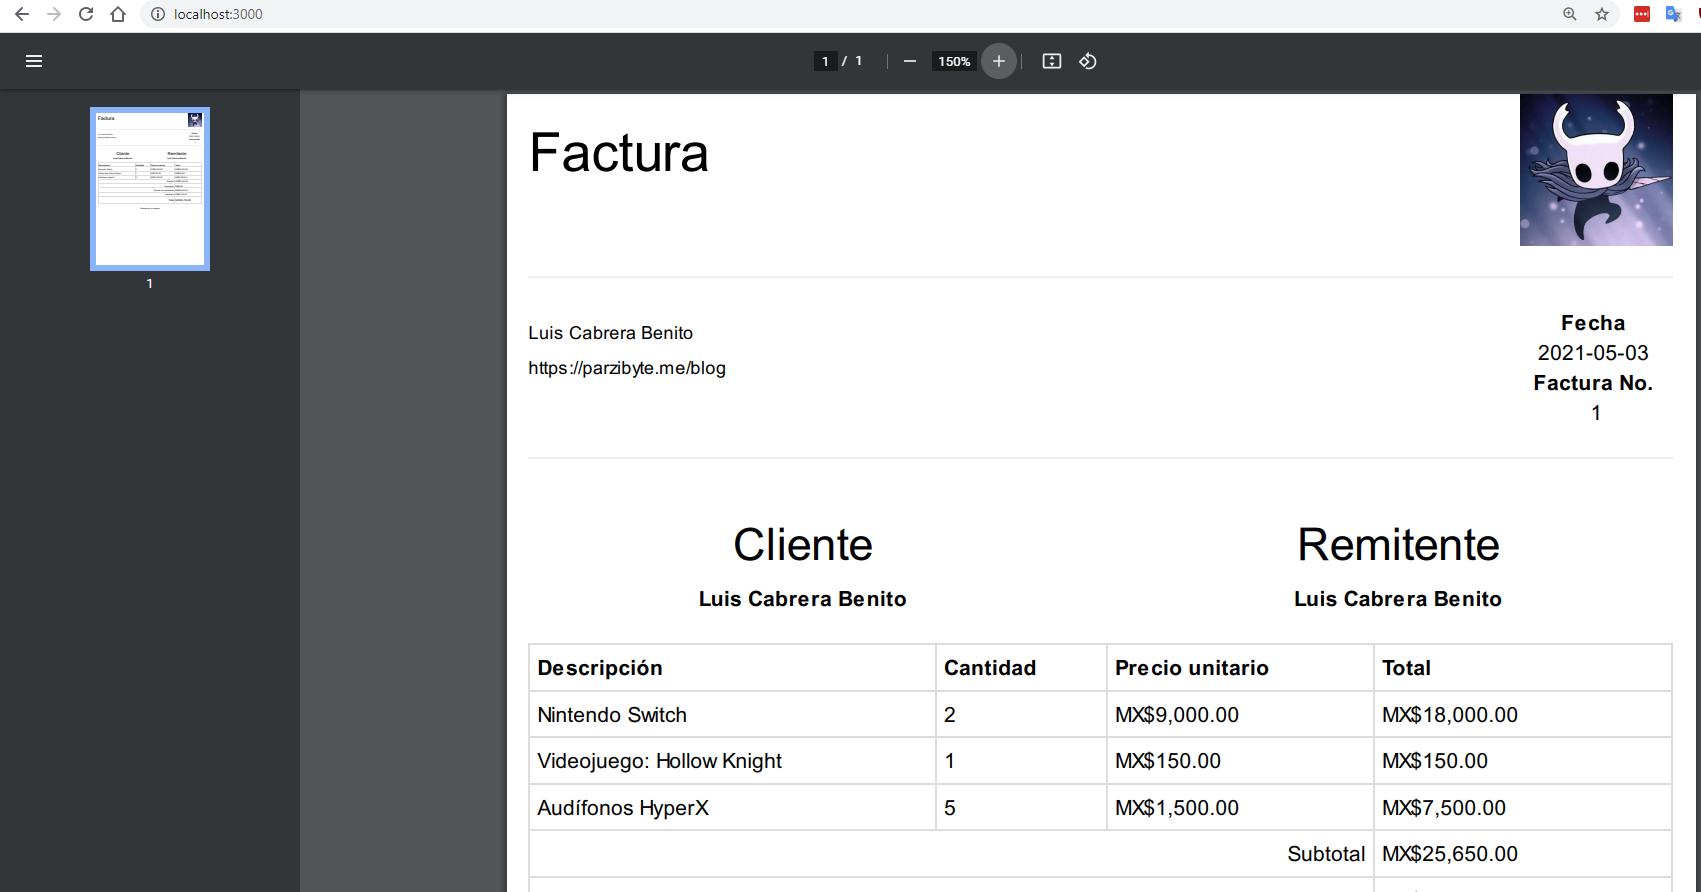 Mostrar factura PDF en navegador usando Node.js y Express